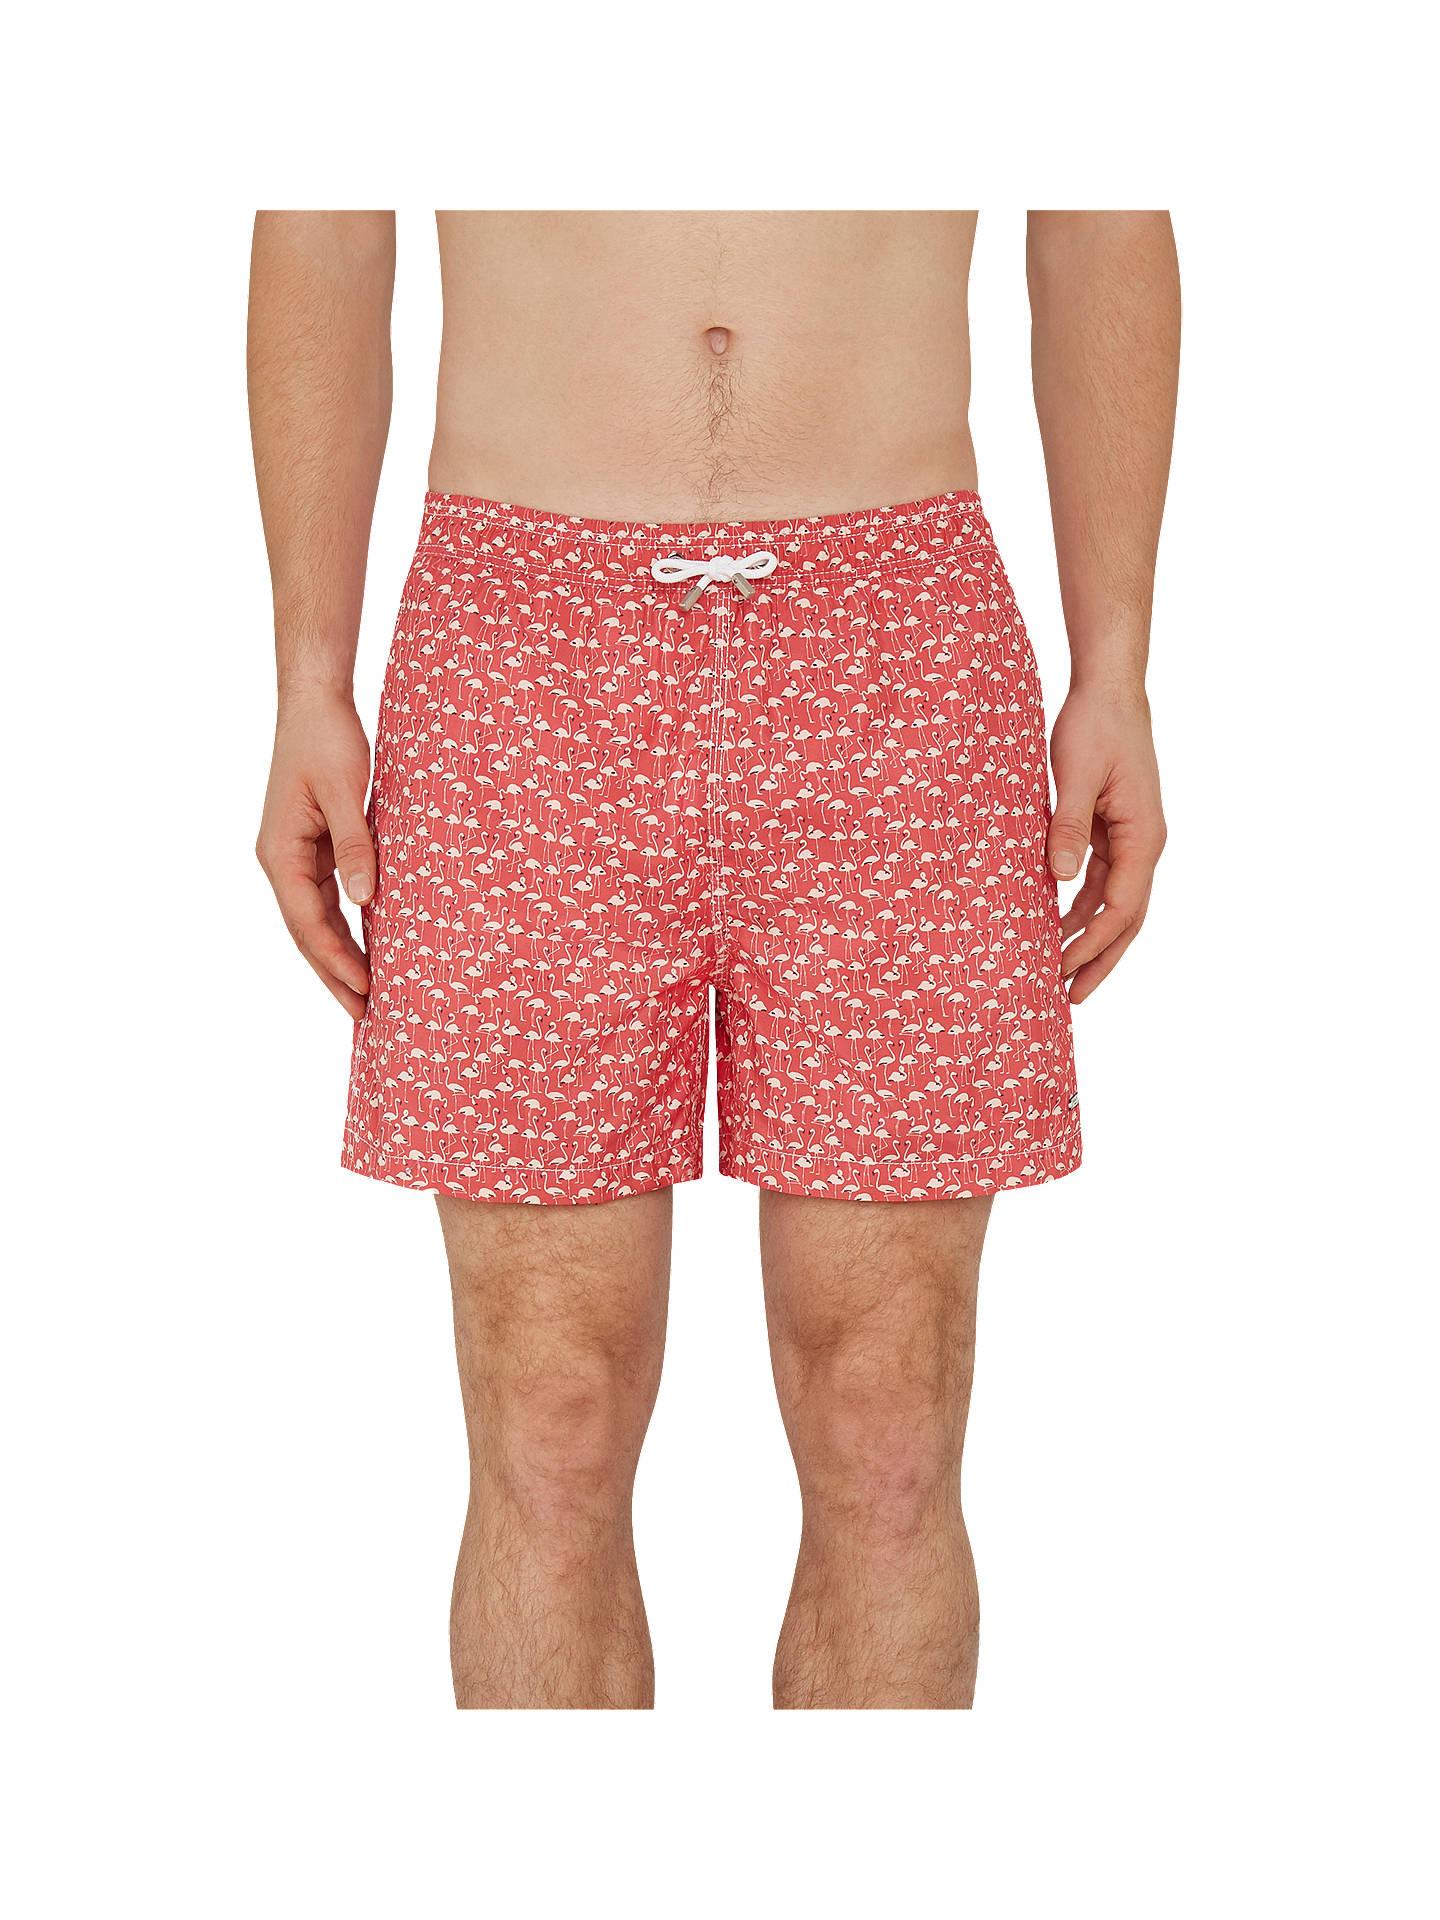 fd84604c7a86 Buy Hackett London Flamingo Print Swim Shorts, Coral, M Online at  johnlewis.com ...